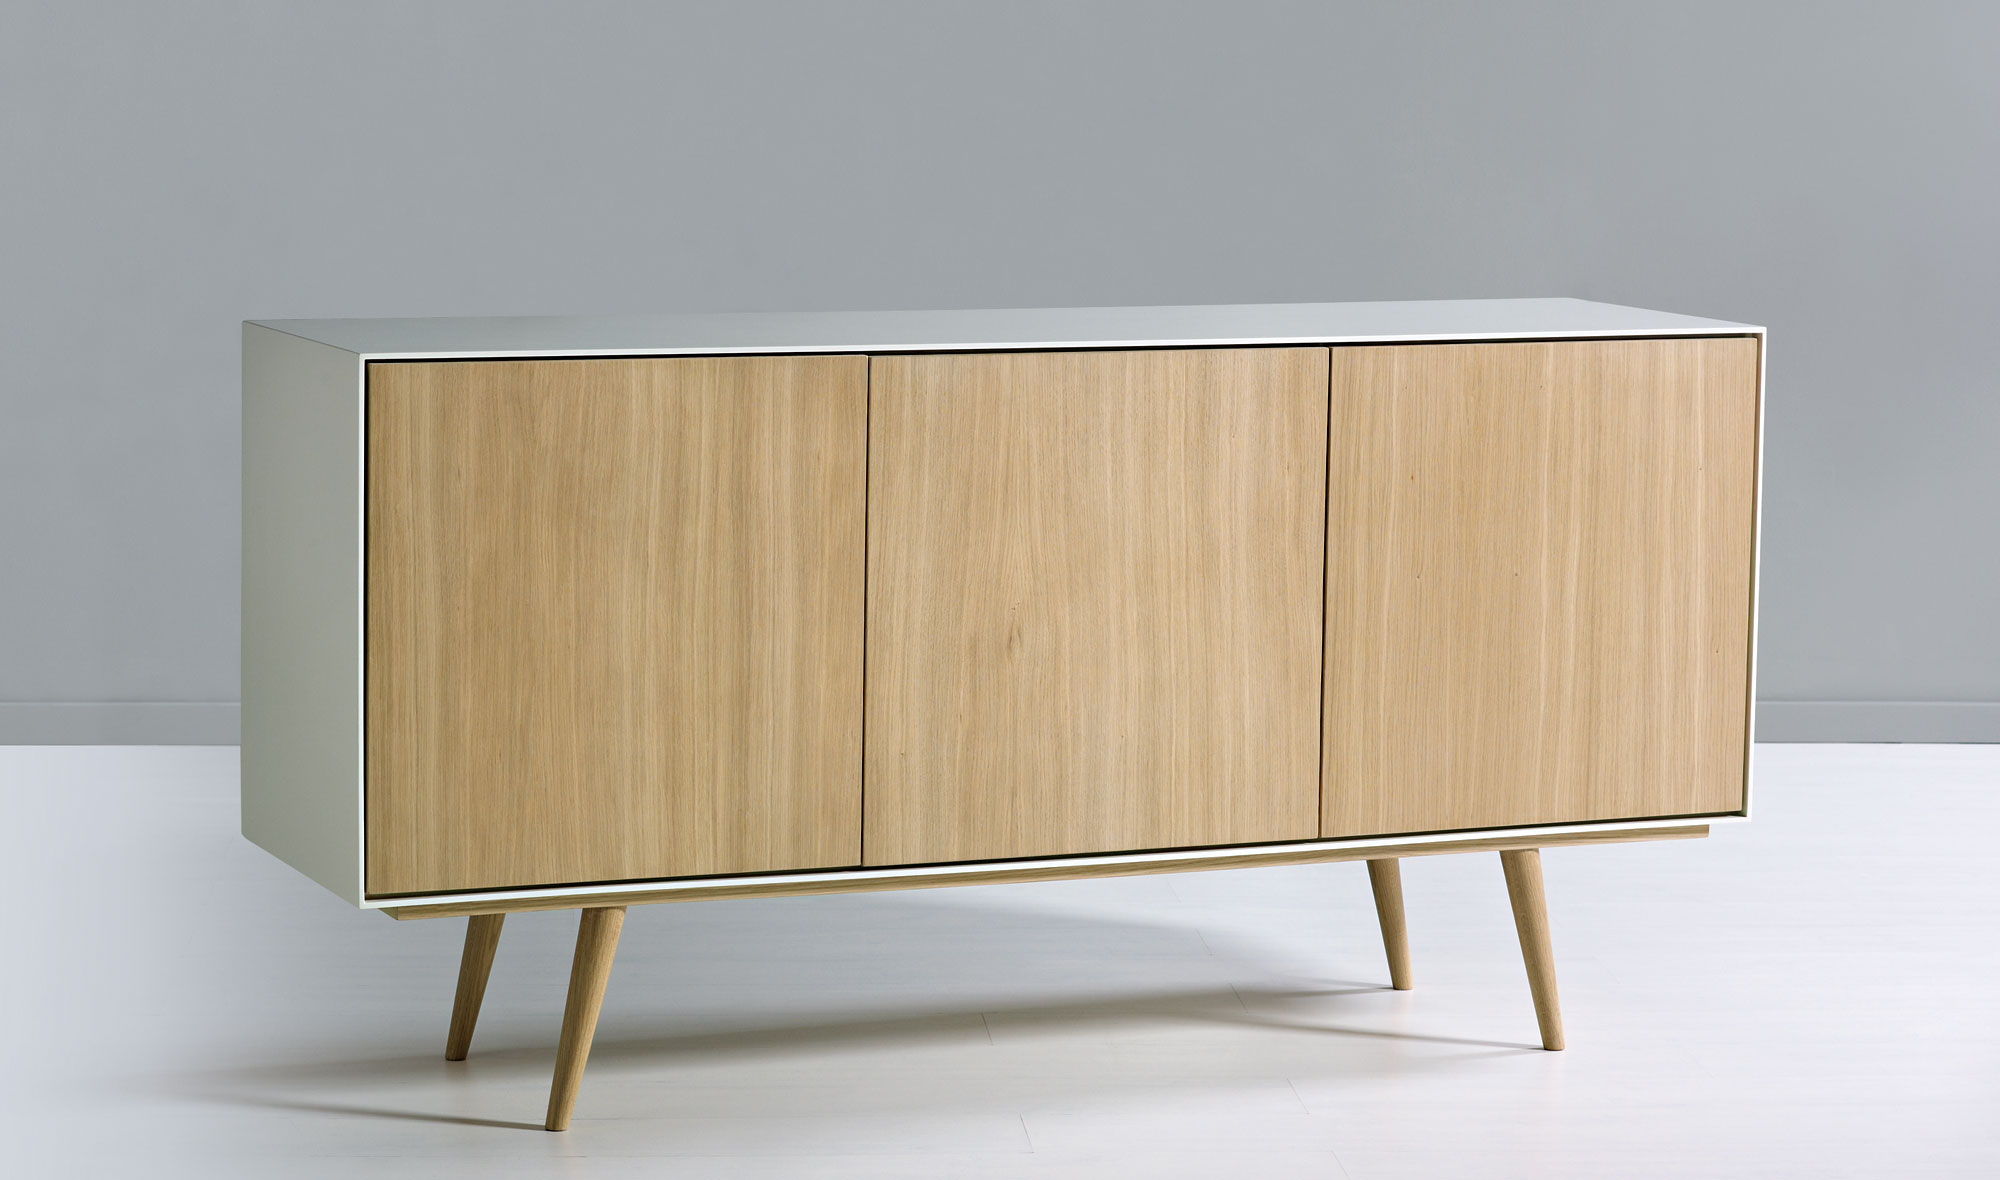 Muebles de foja obtenga ideas dise o de muebles para su - Muebles portobello ...